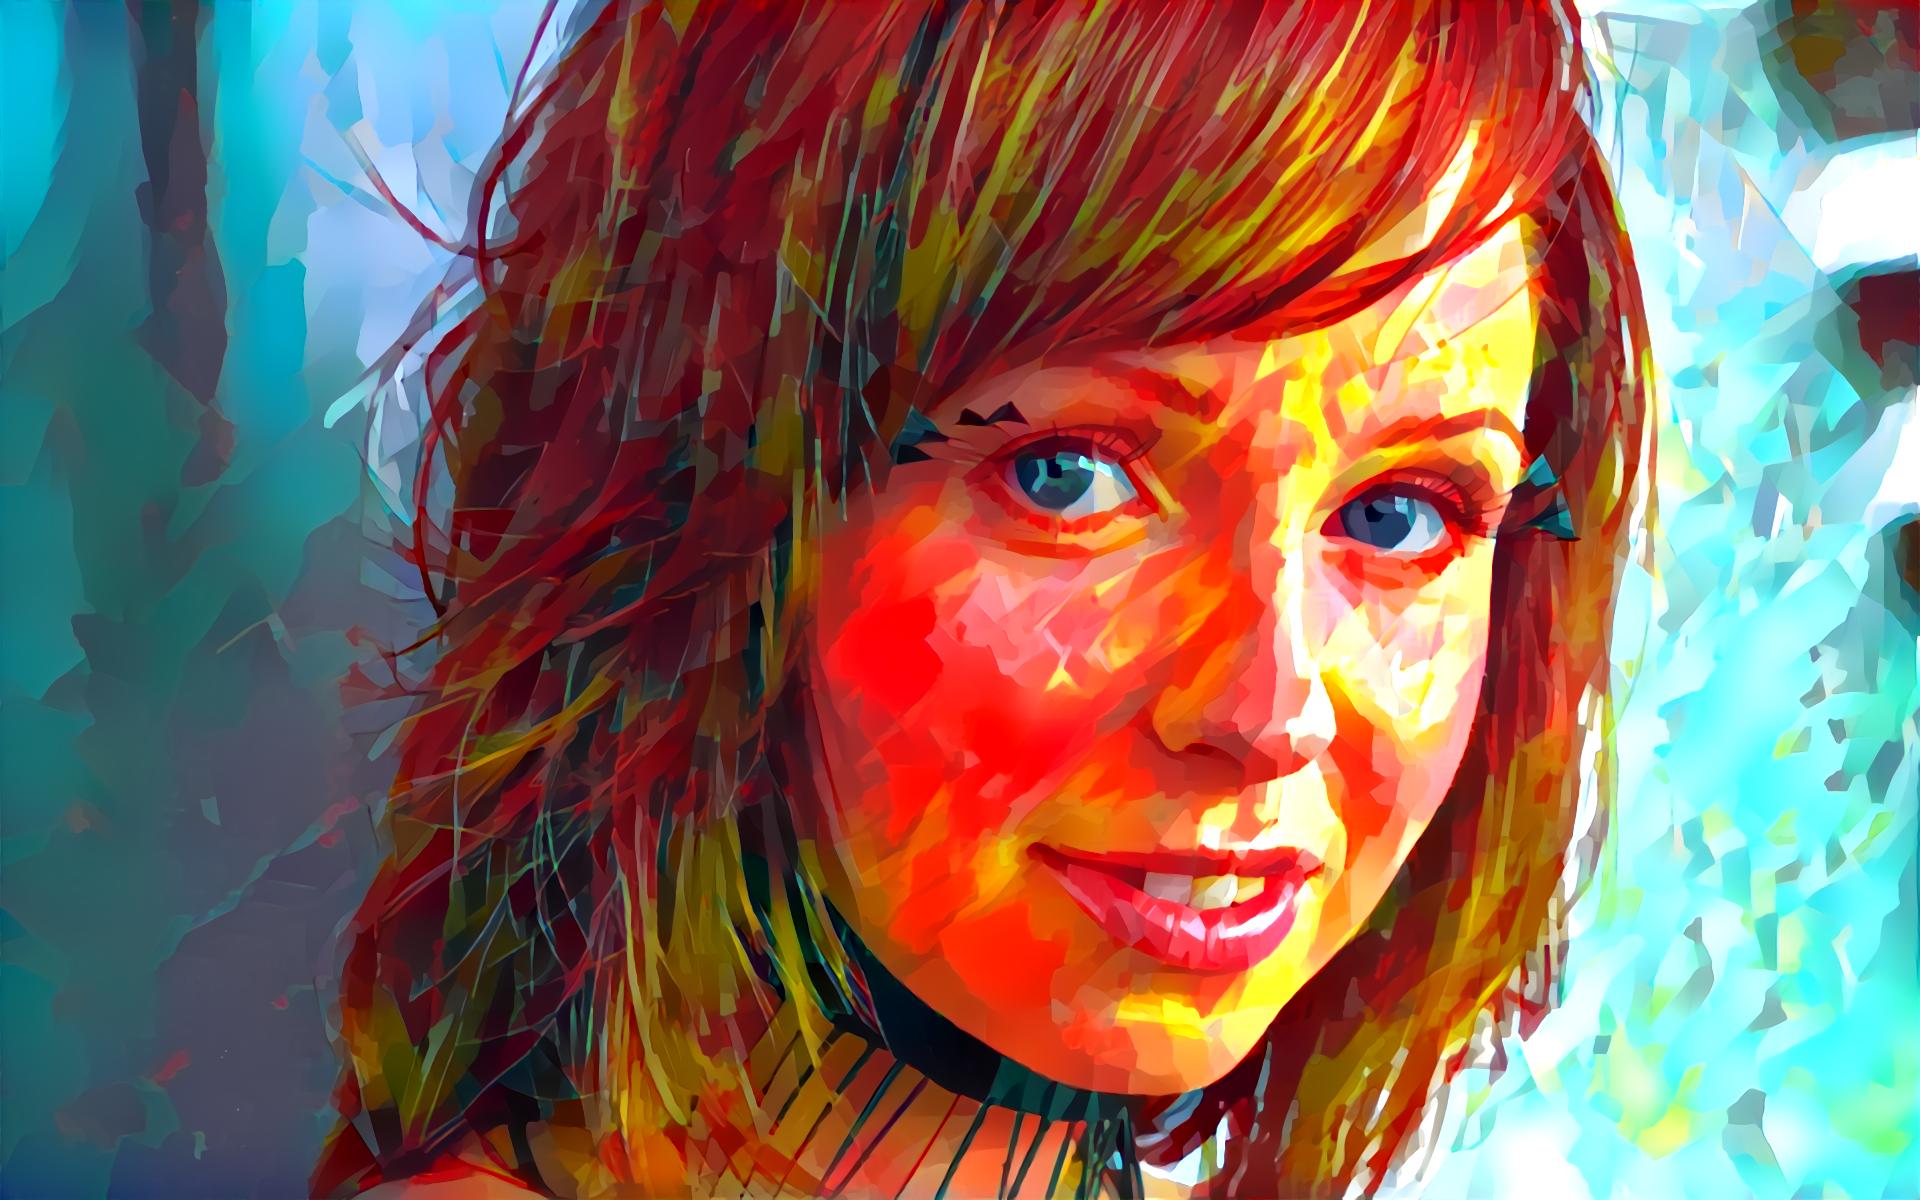 Face Painting People Red Artwork Clown Head Hayden Winters Deep Art Art Color Eye Special Effects